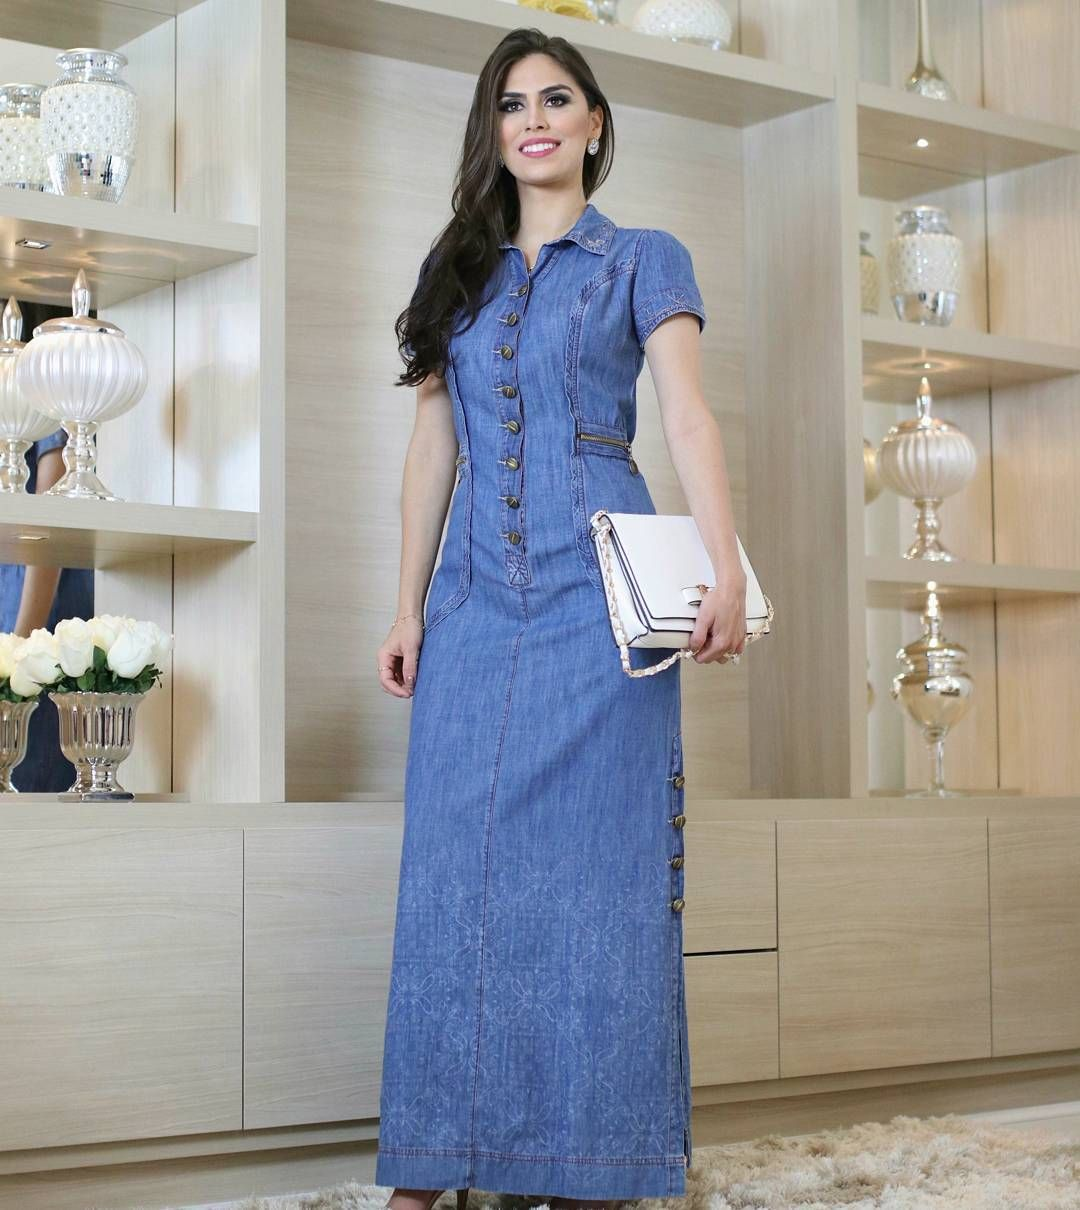 Maxi Dresses Full Skirts Clothing Templates Bridal